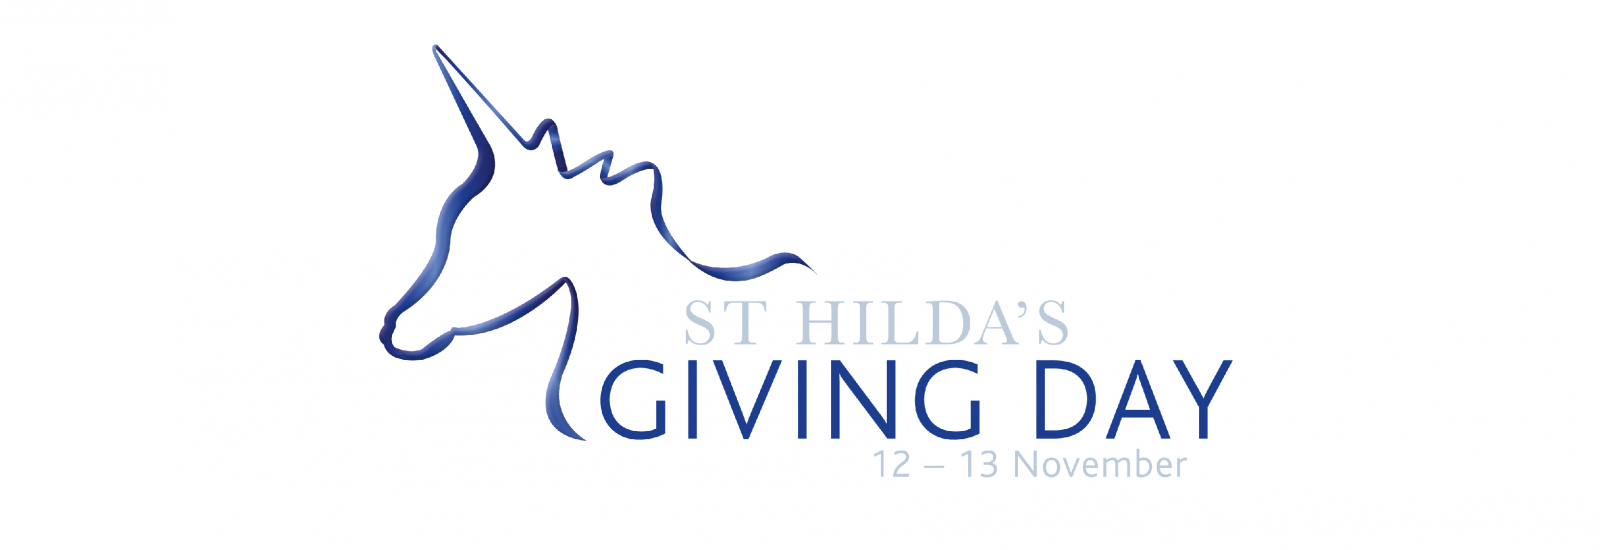 Giving Day - 12-13 November 2019